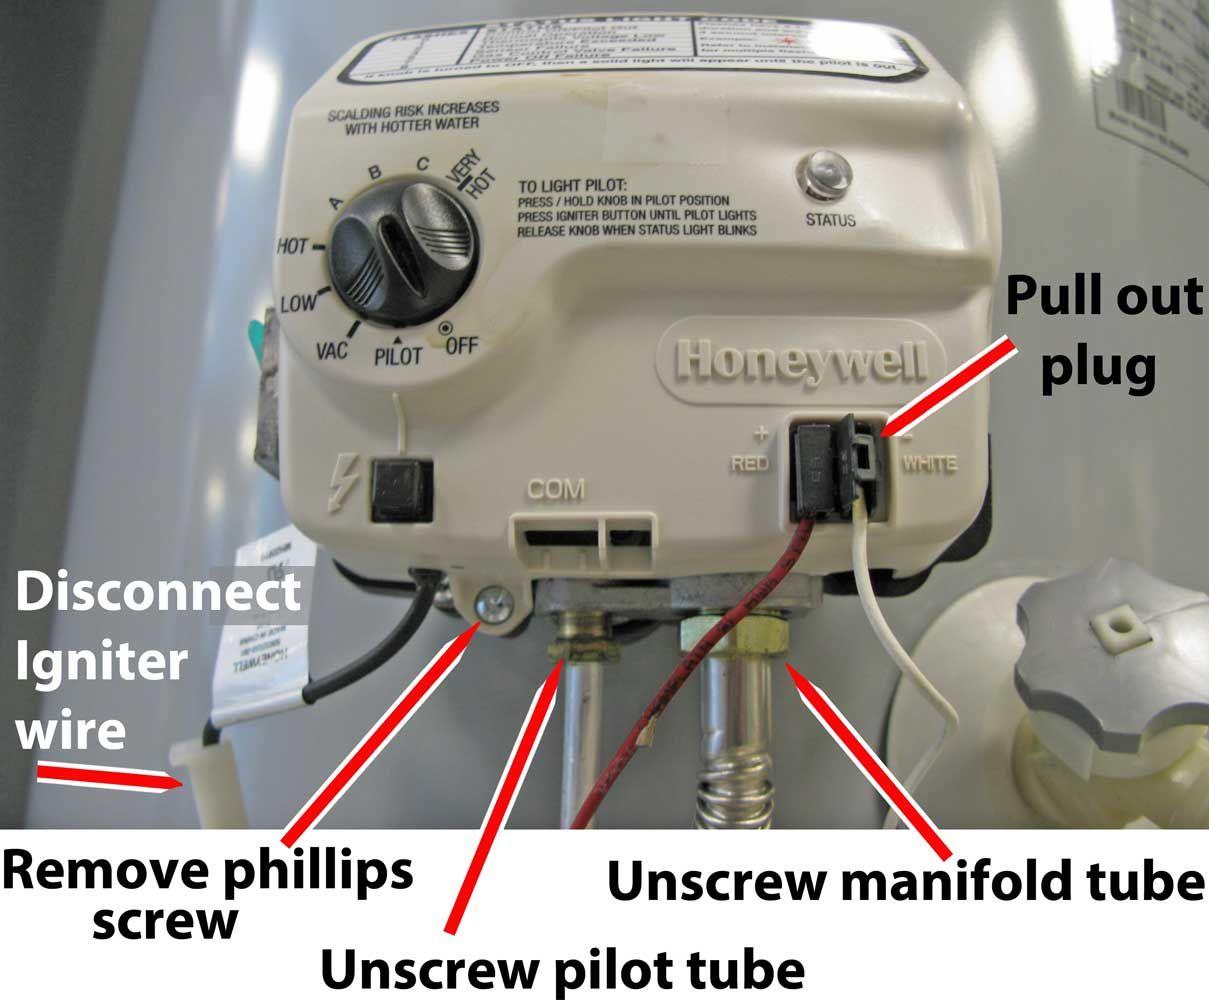 honeywell gas valve wiring diagram for hot tub 34